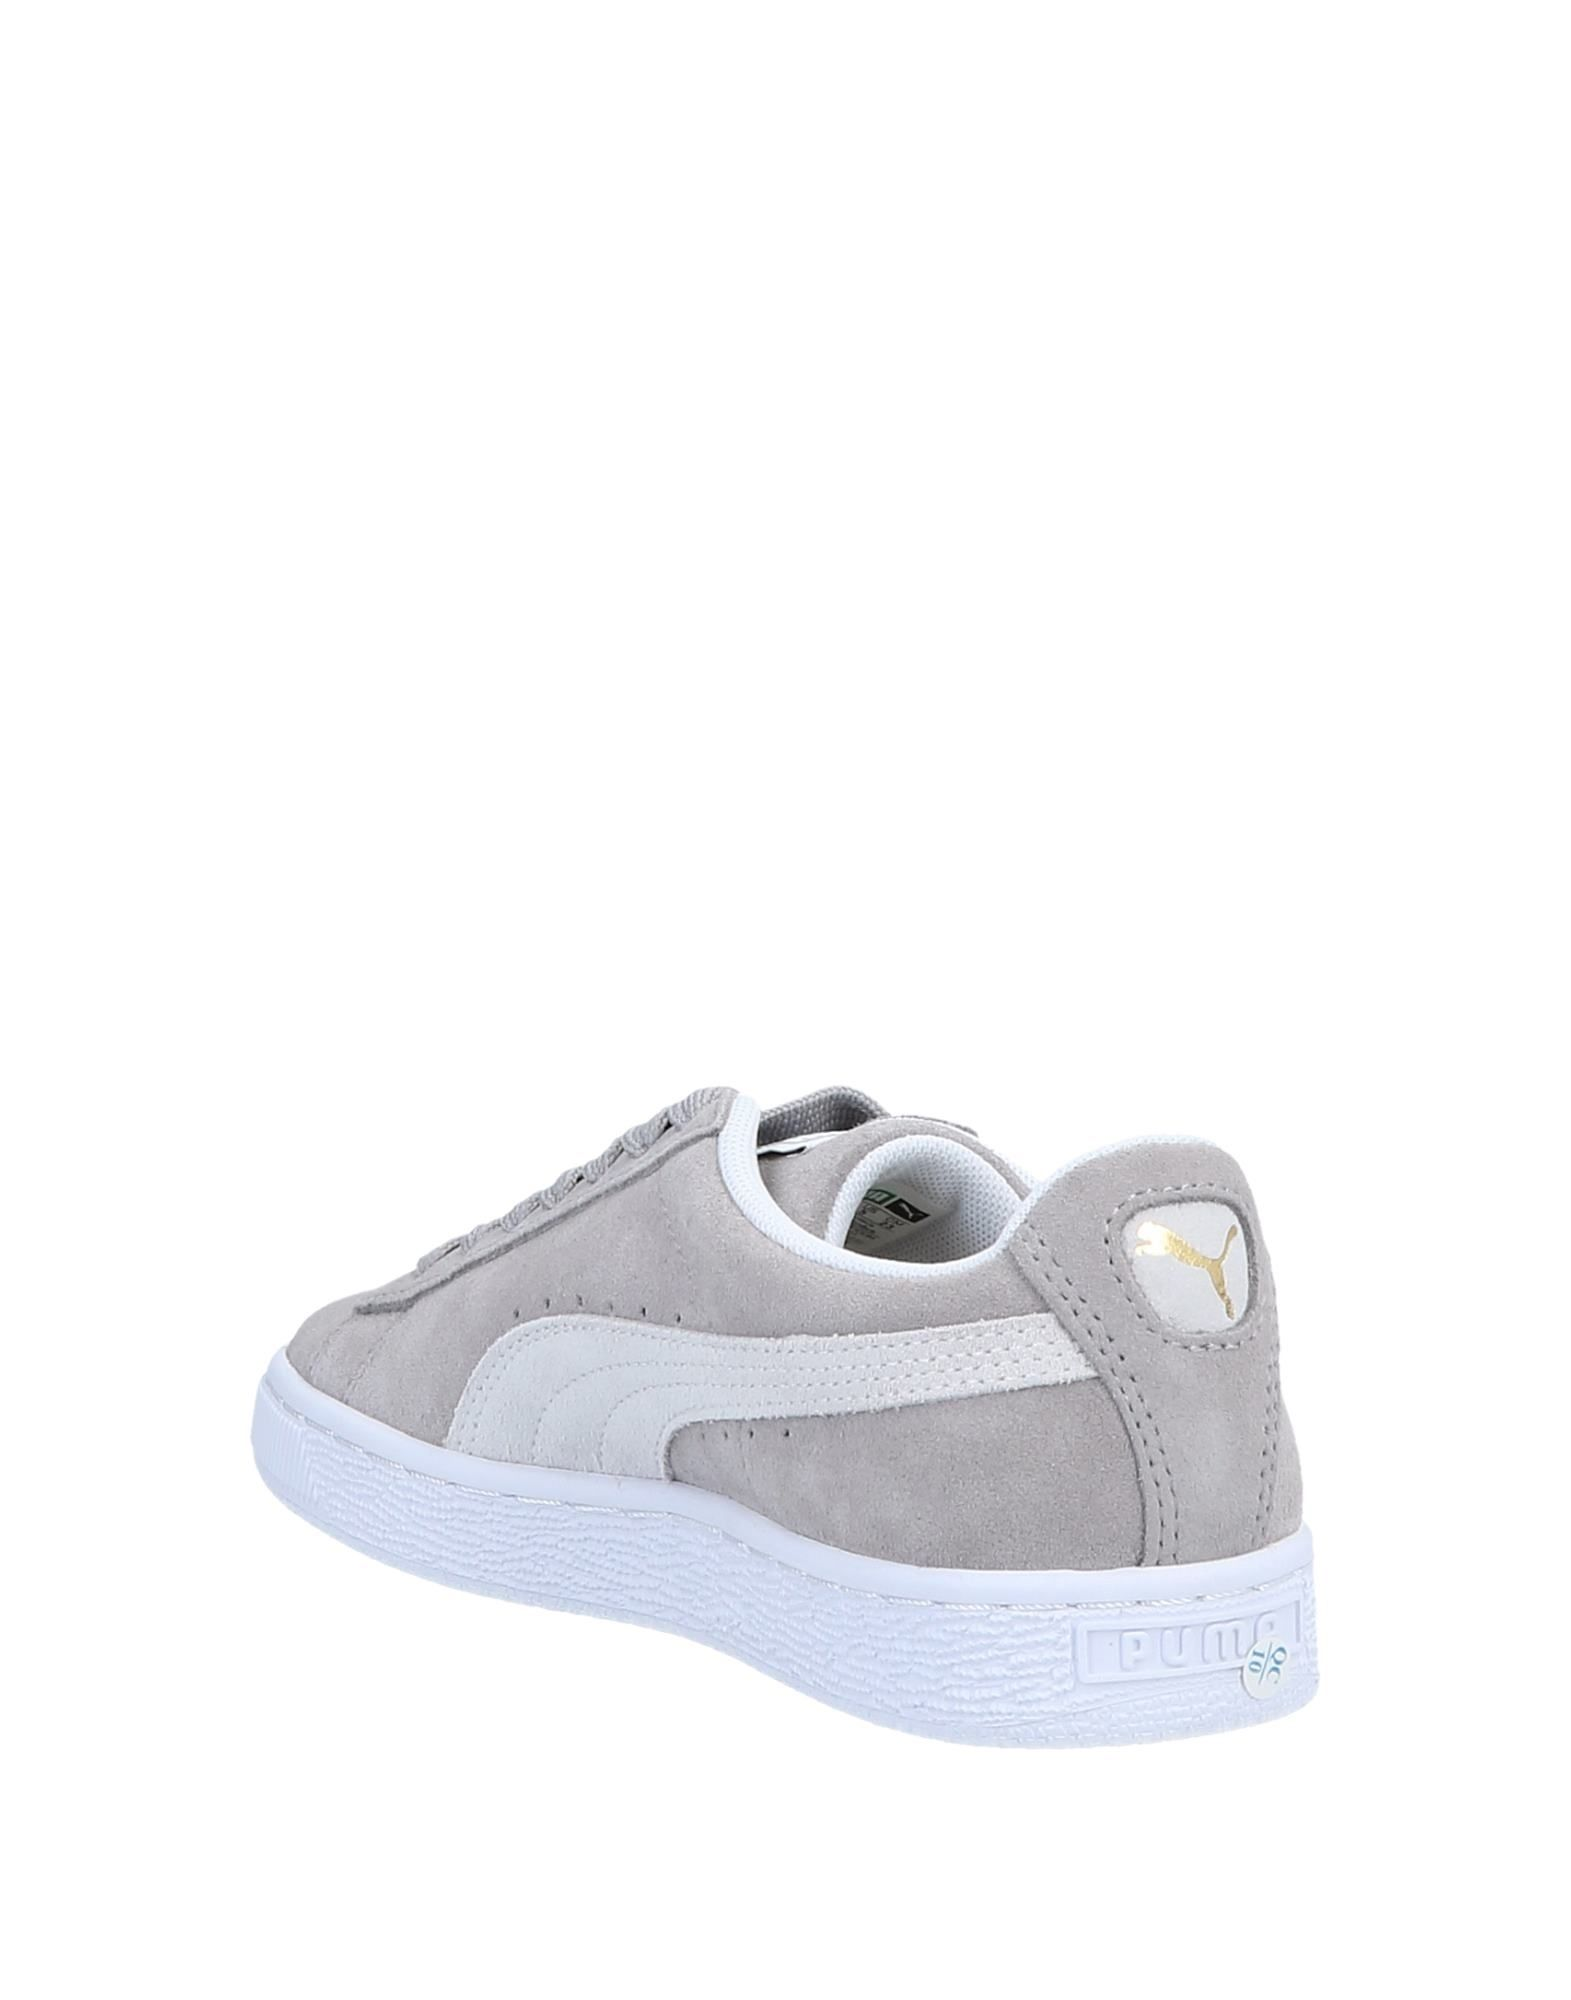 Puma Sneakers Damen  11561863RO Schuhe Gute Qualität beliebte Schuhe 11561863RO 88614e